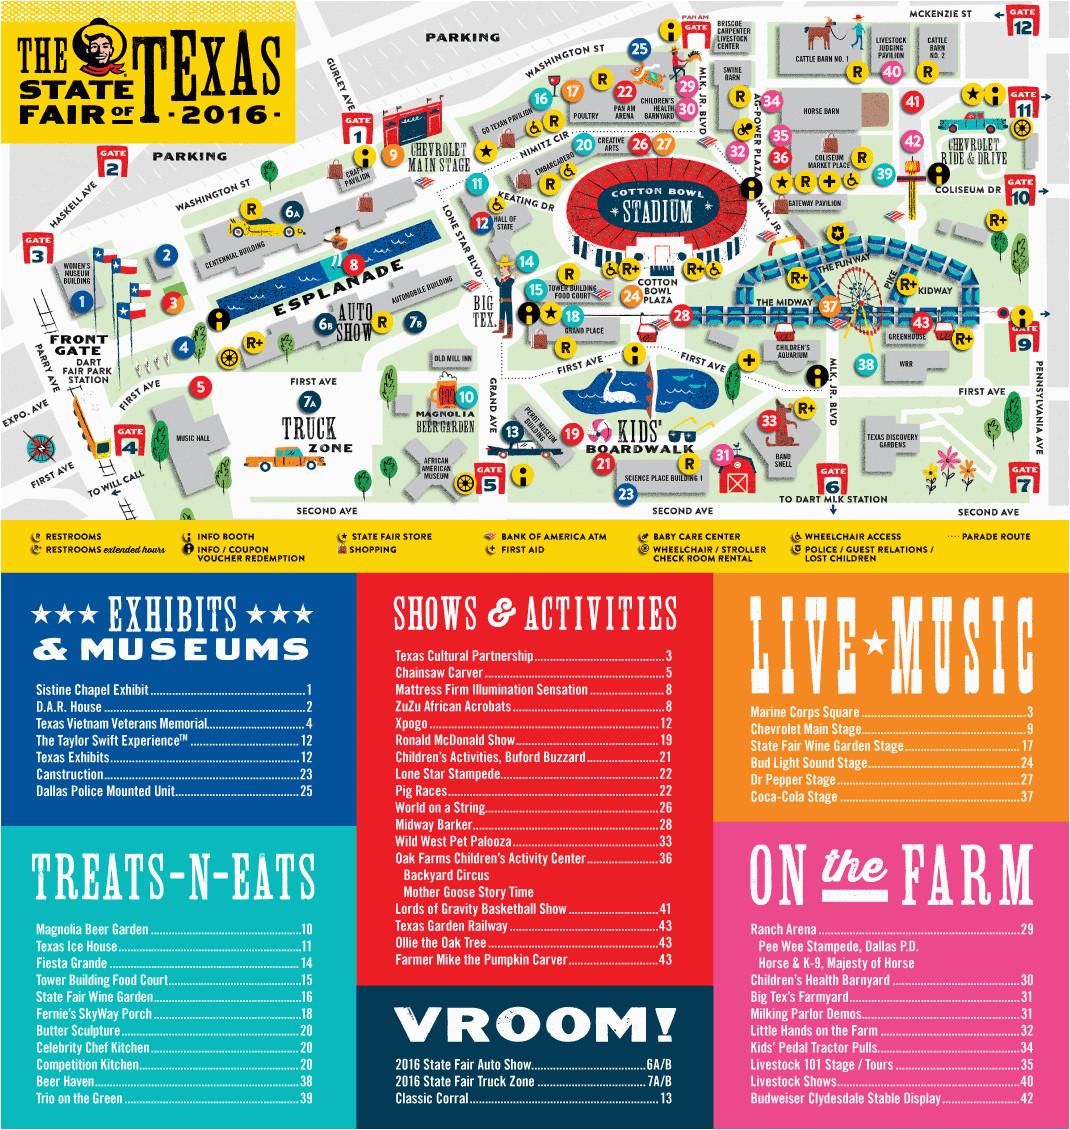 state fair of texas parking map business ideas 2013